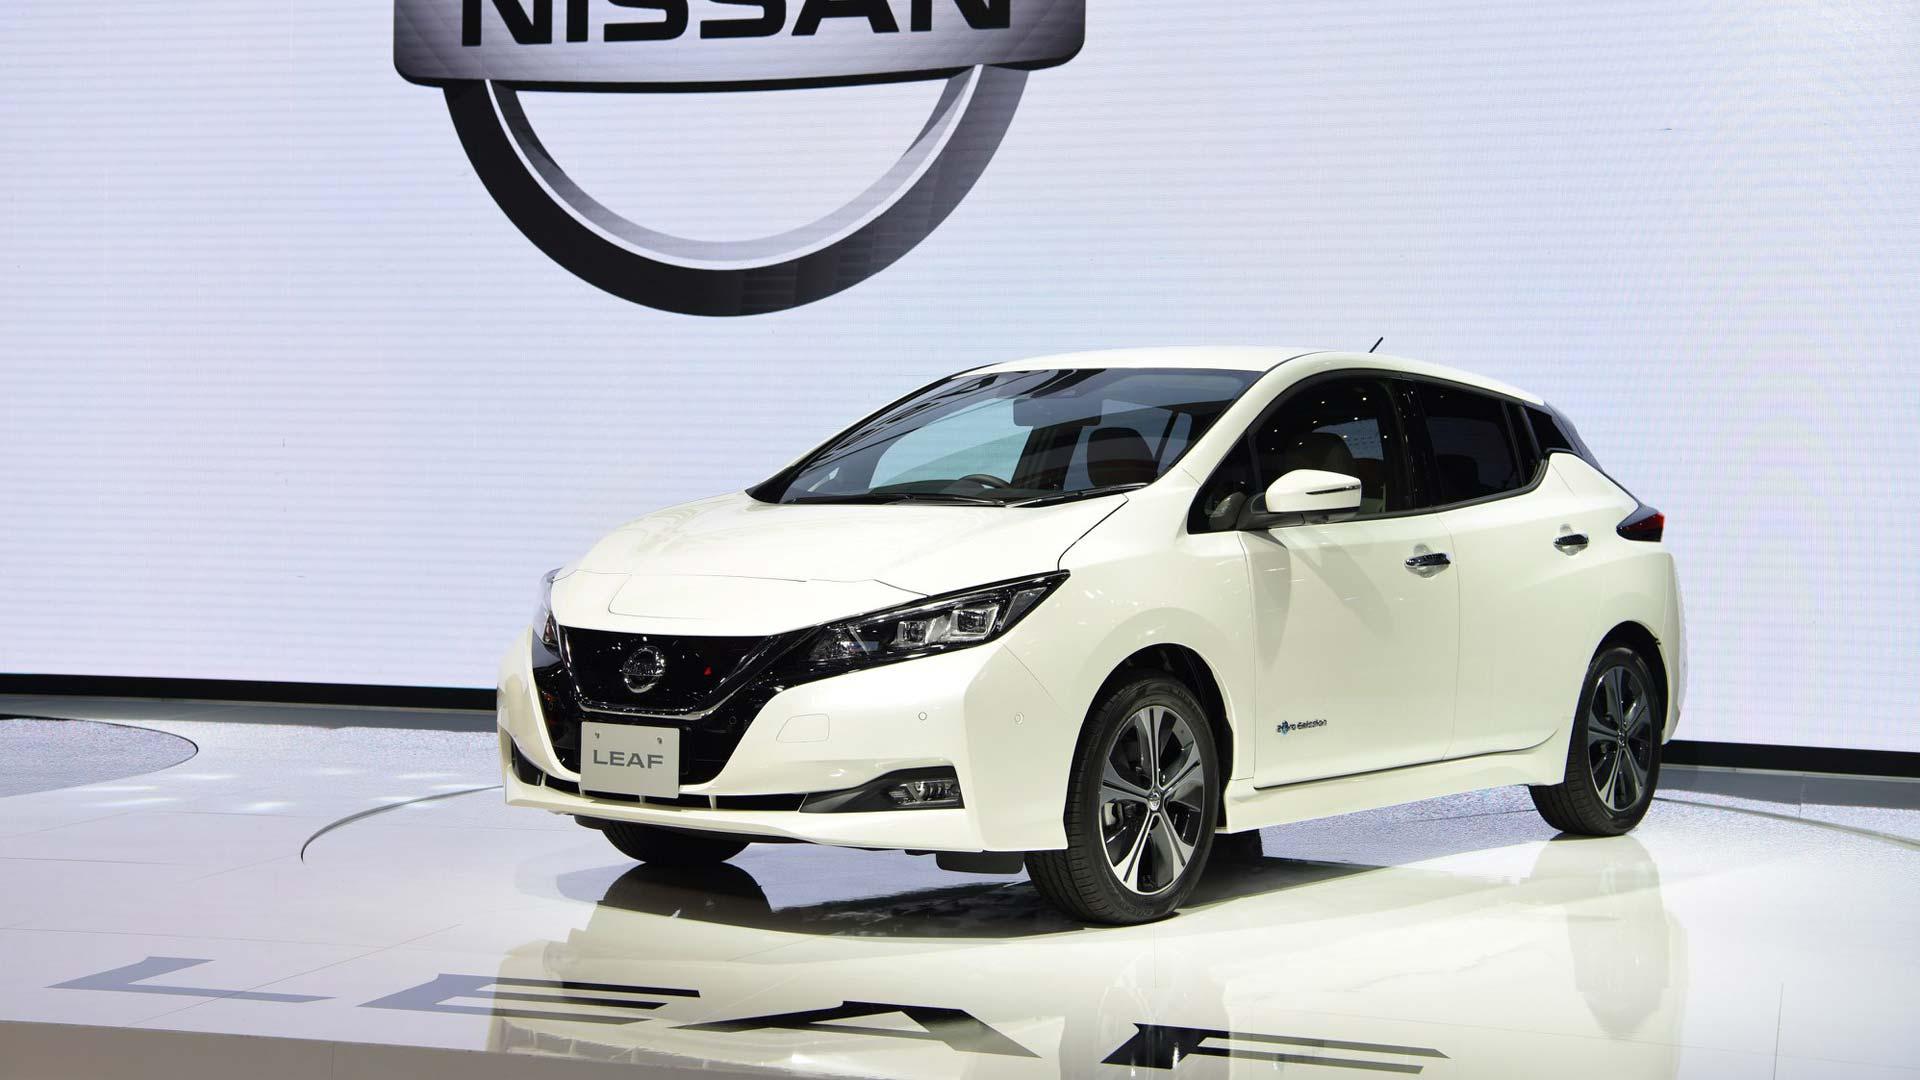 2018-Nissan-Leaf-Thailand-Motor-Show-2018_2